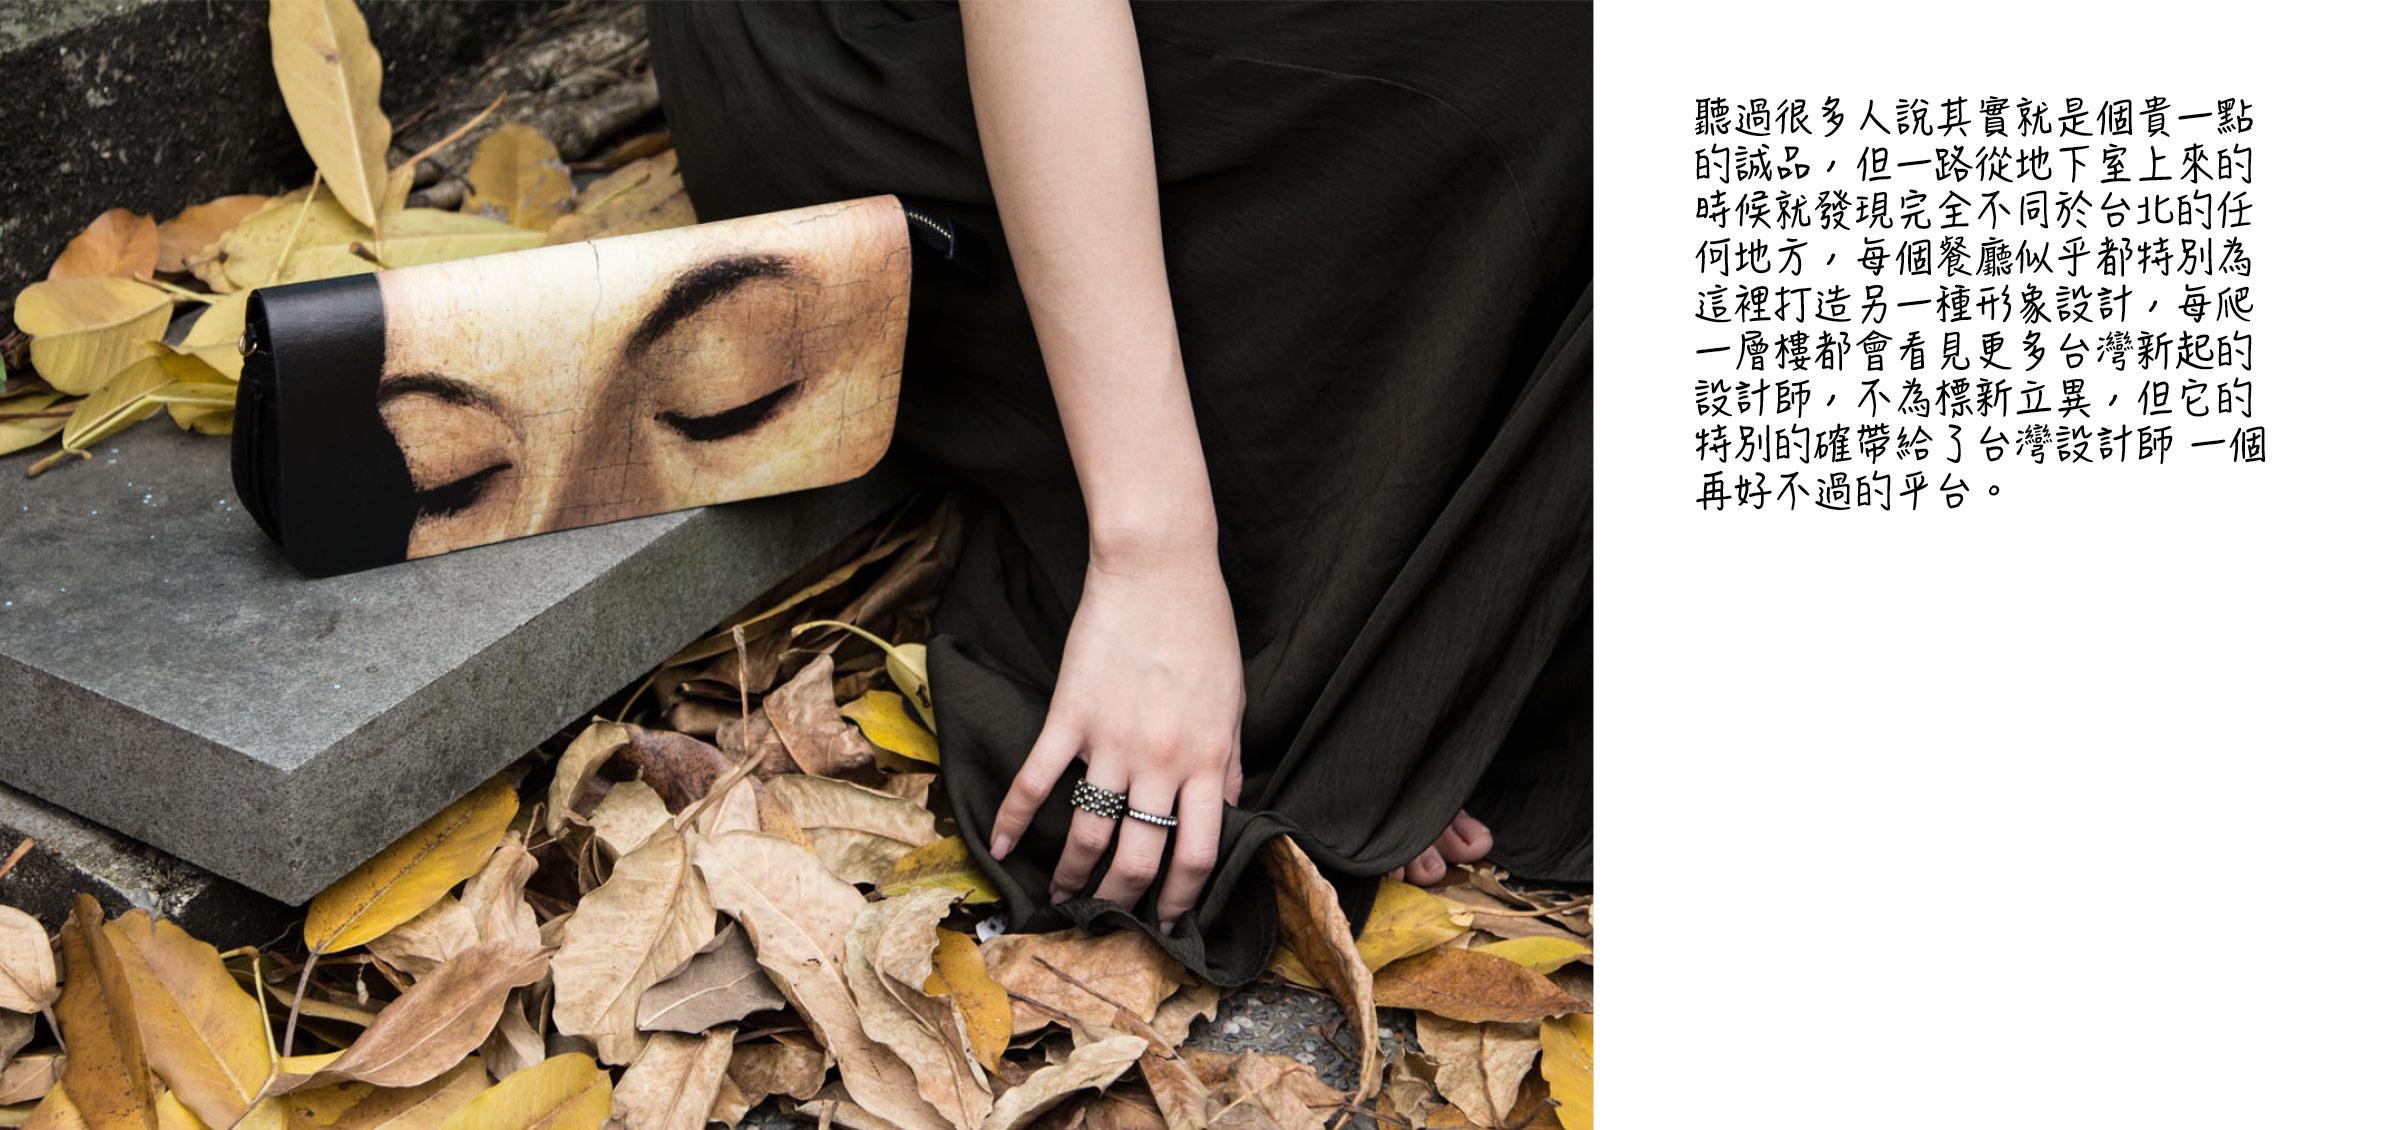 Rice & Shine - Travel Blog - Old Soul 2.jpg